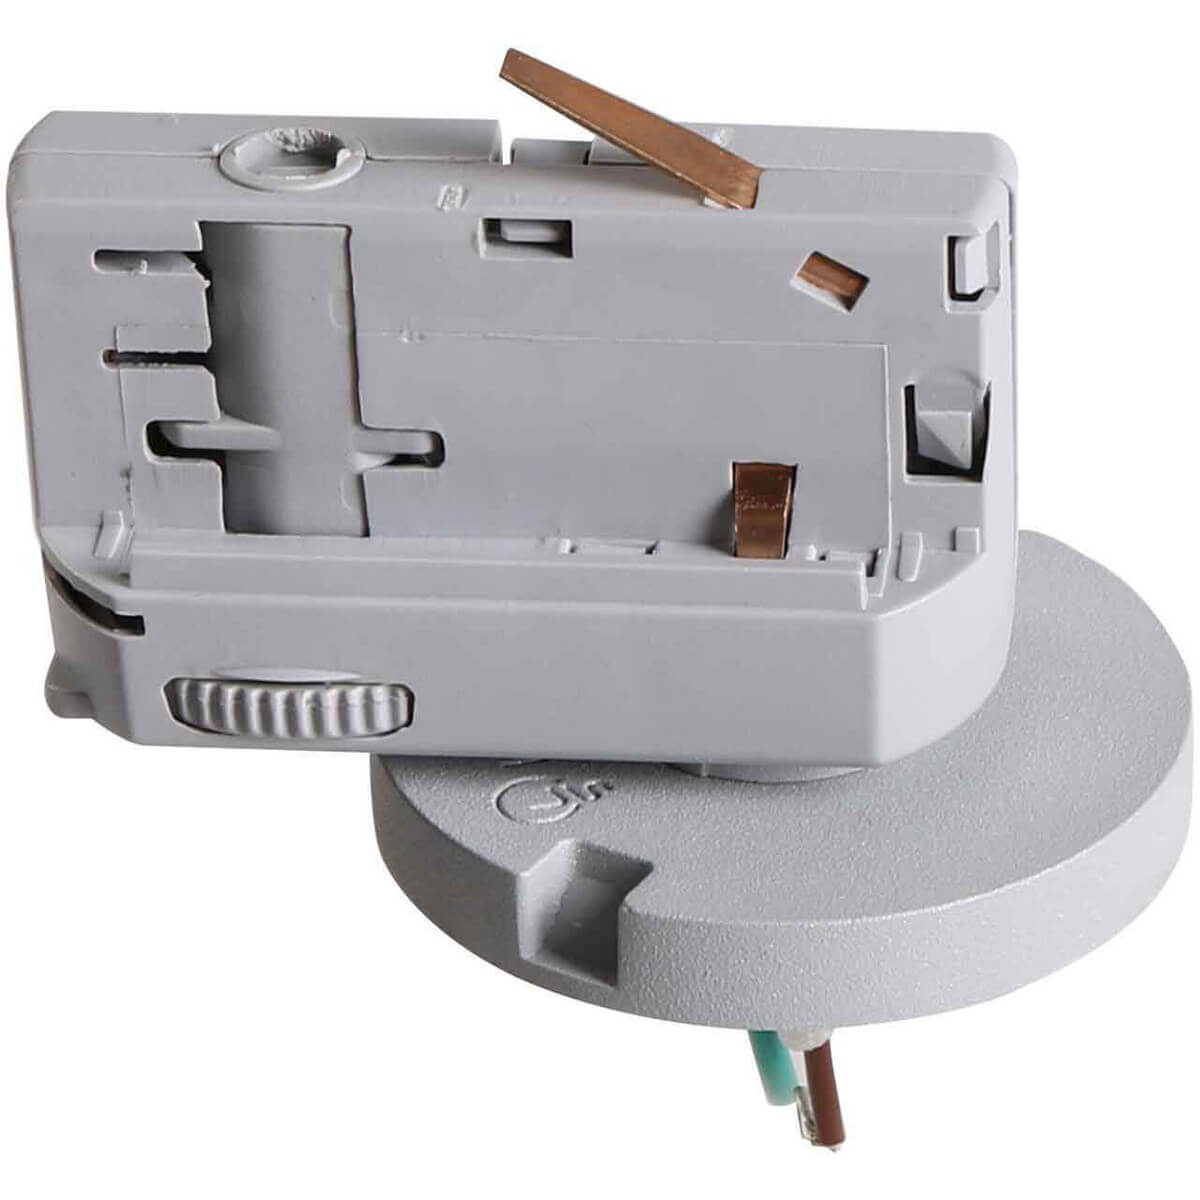 Адаптер для шинопровода Lightstar 594019 Asta Gray (для трехфазного шинопровода)